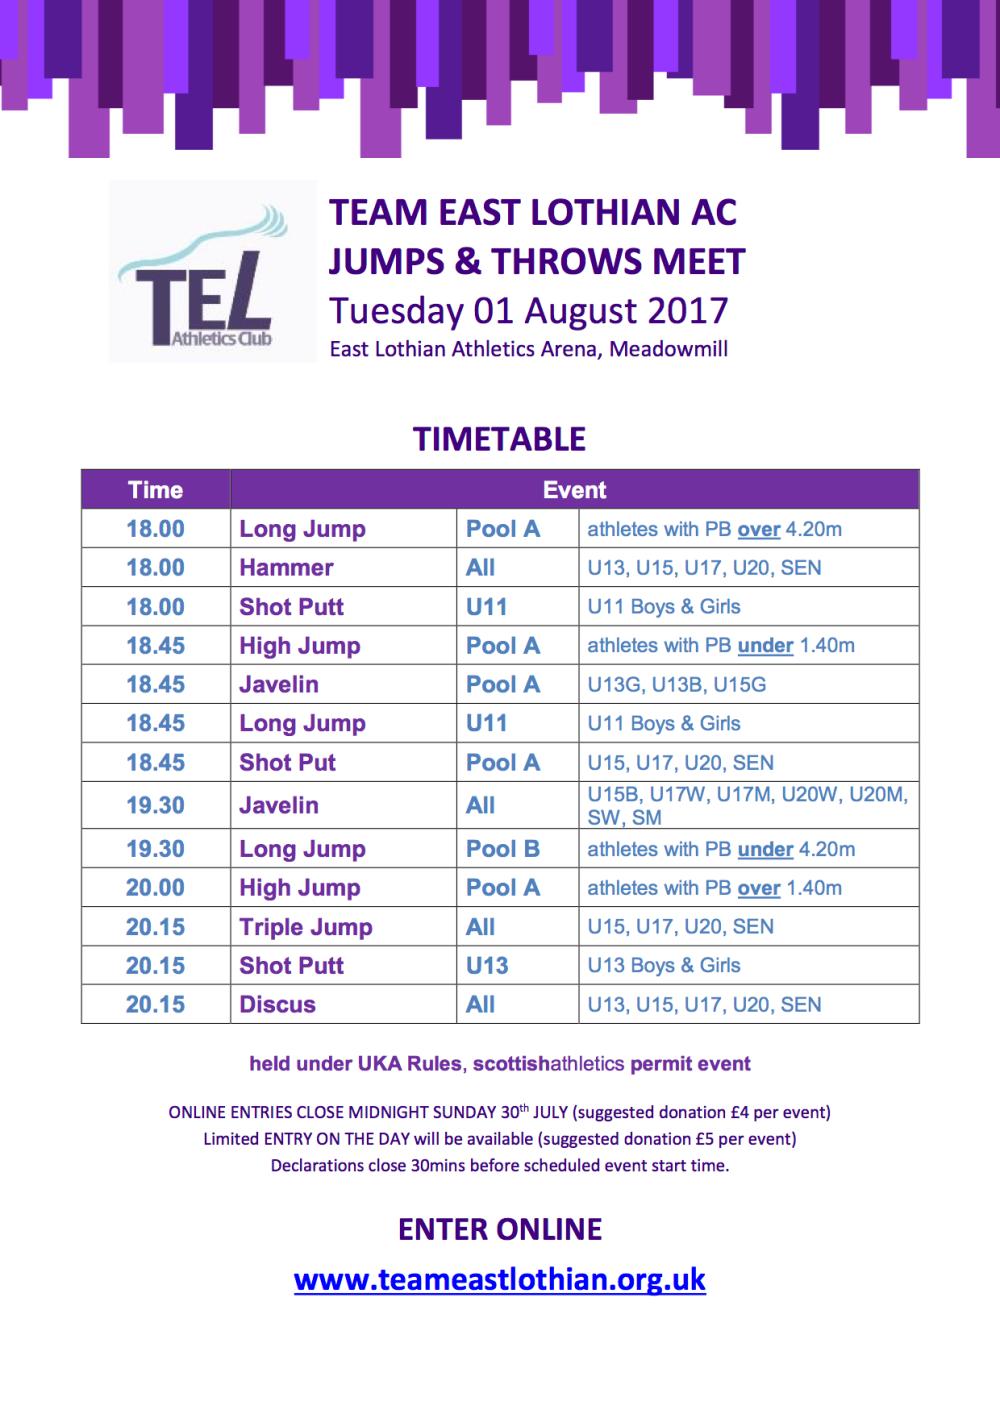 TEL Jumps & Throws